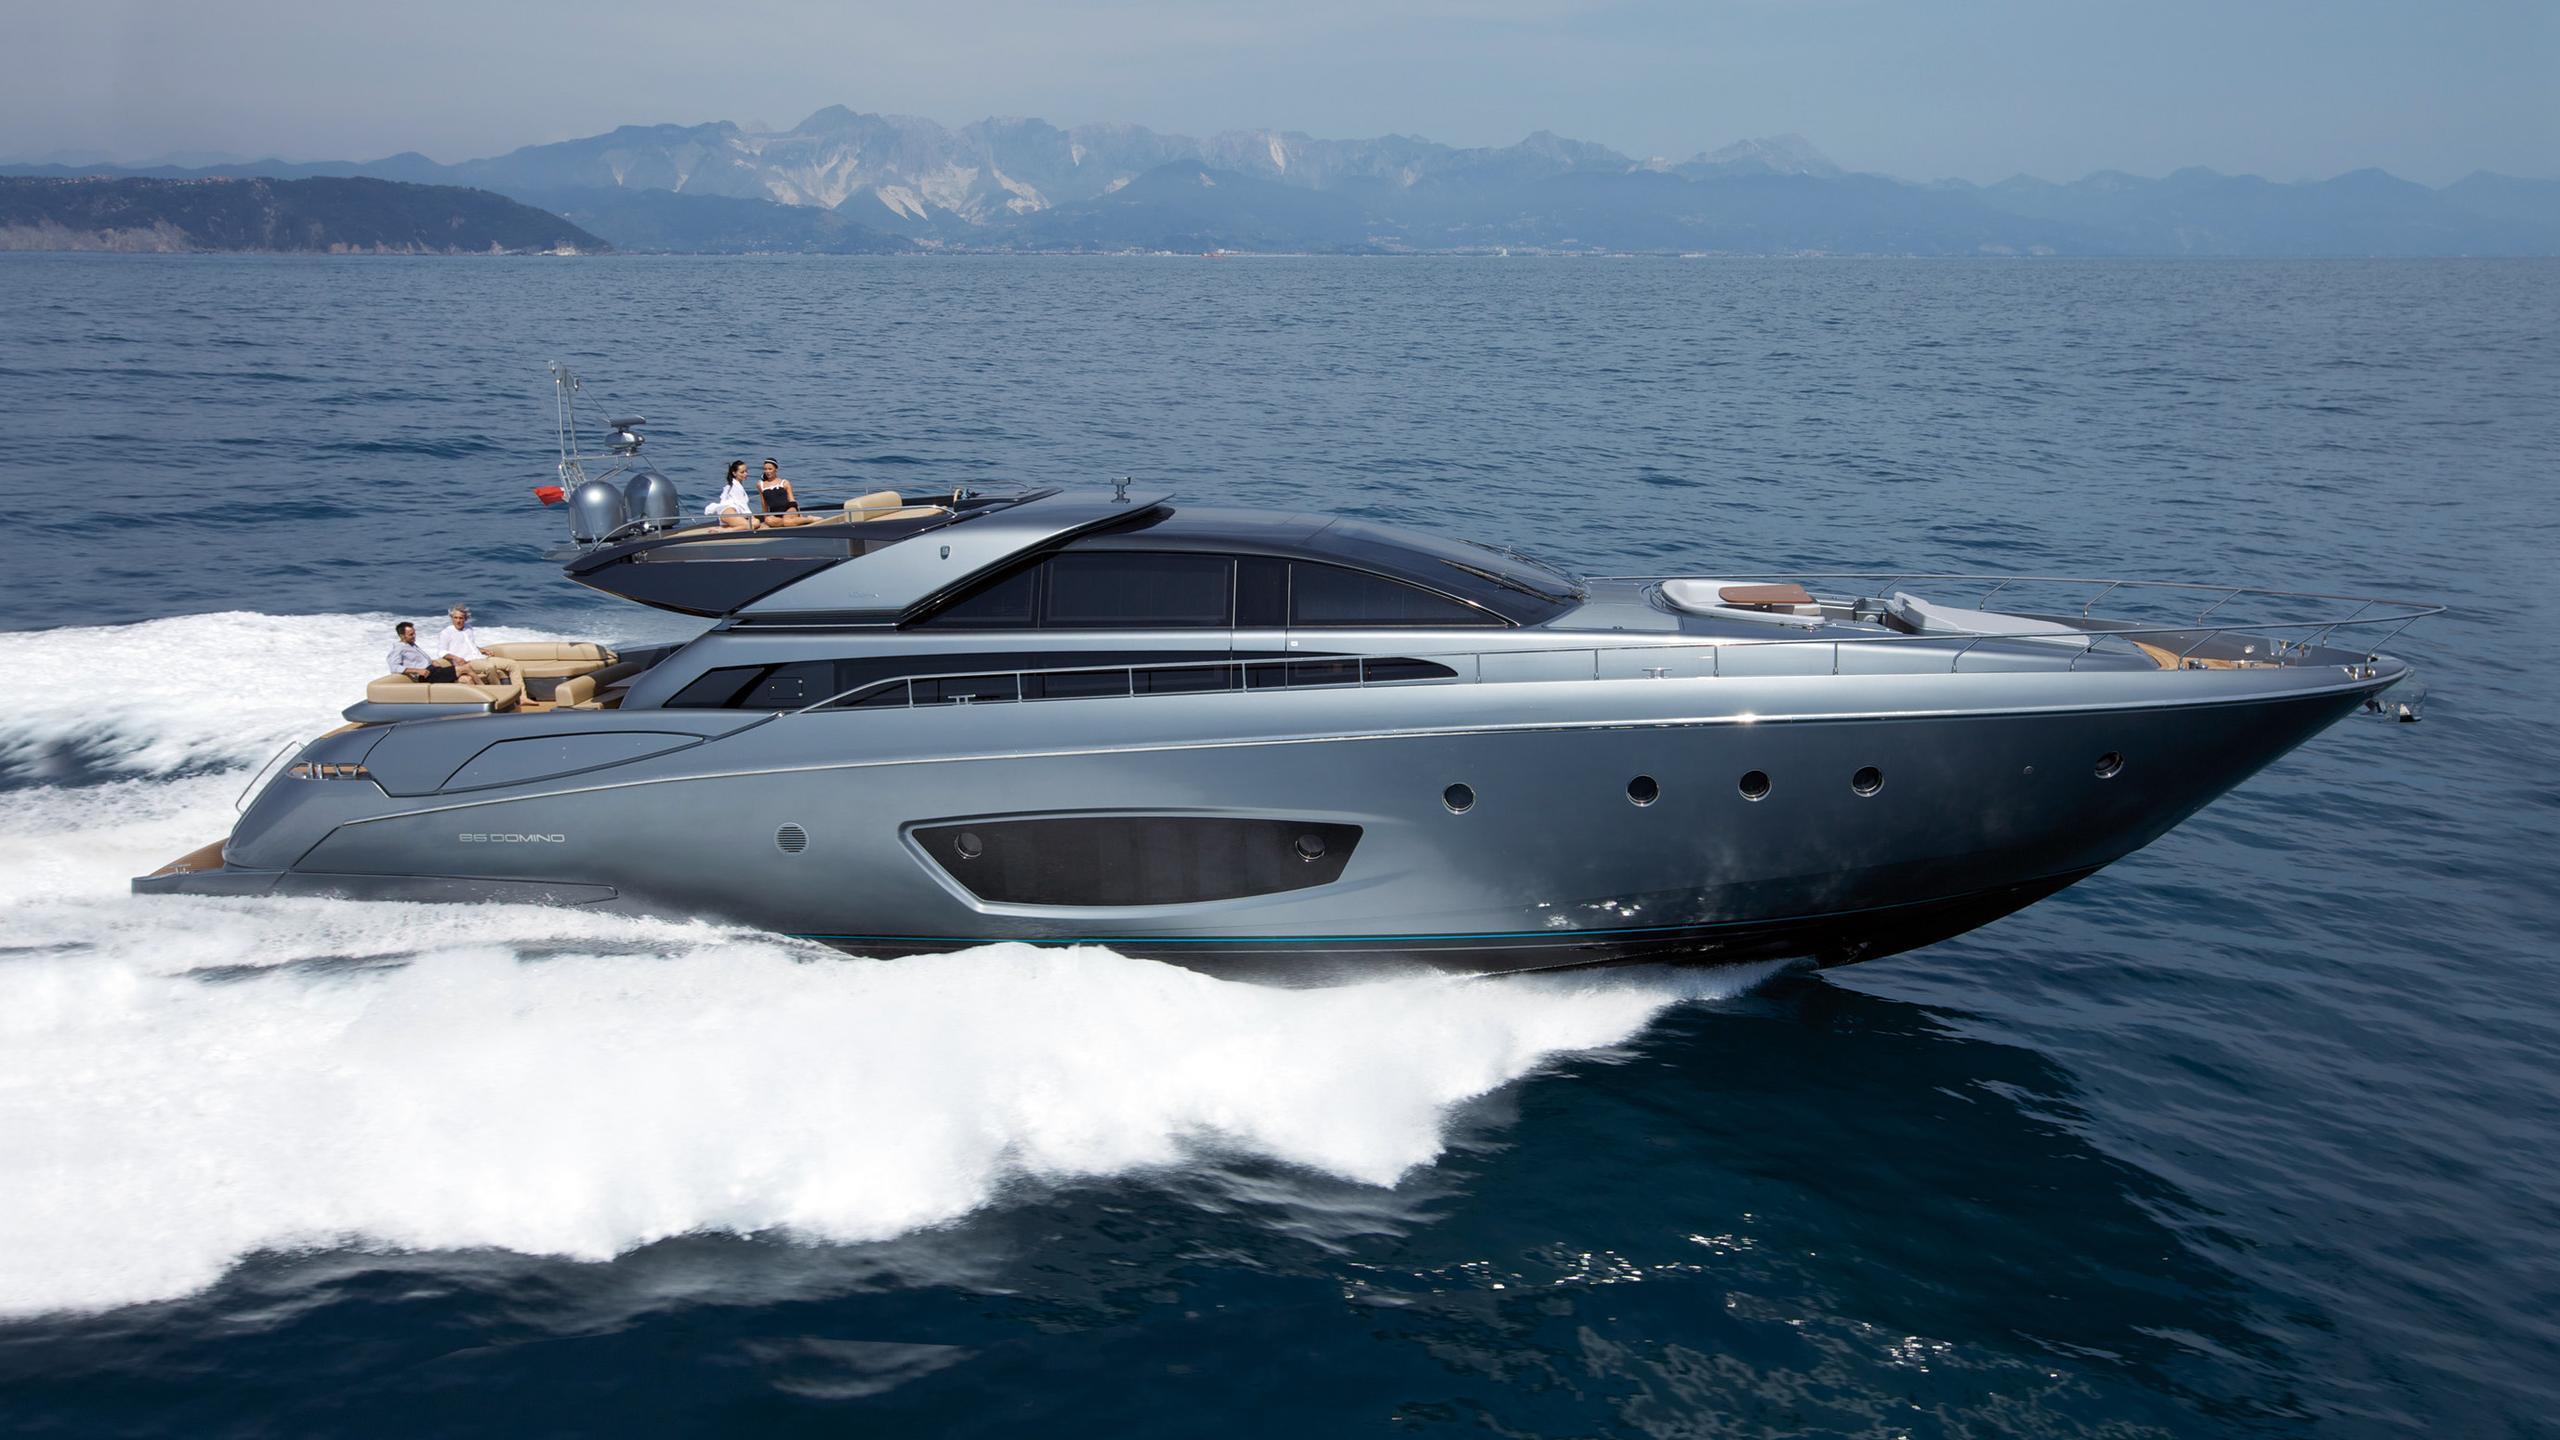 gypsea-riva-86-domino-motor-yacht-2011-26m-profile-sistership